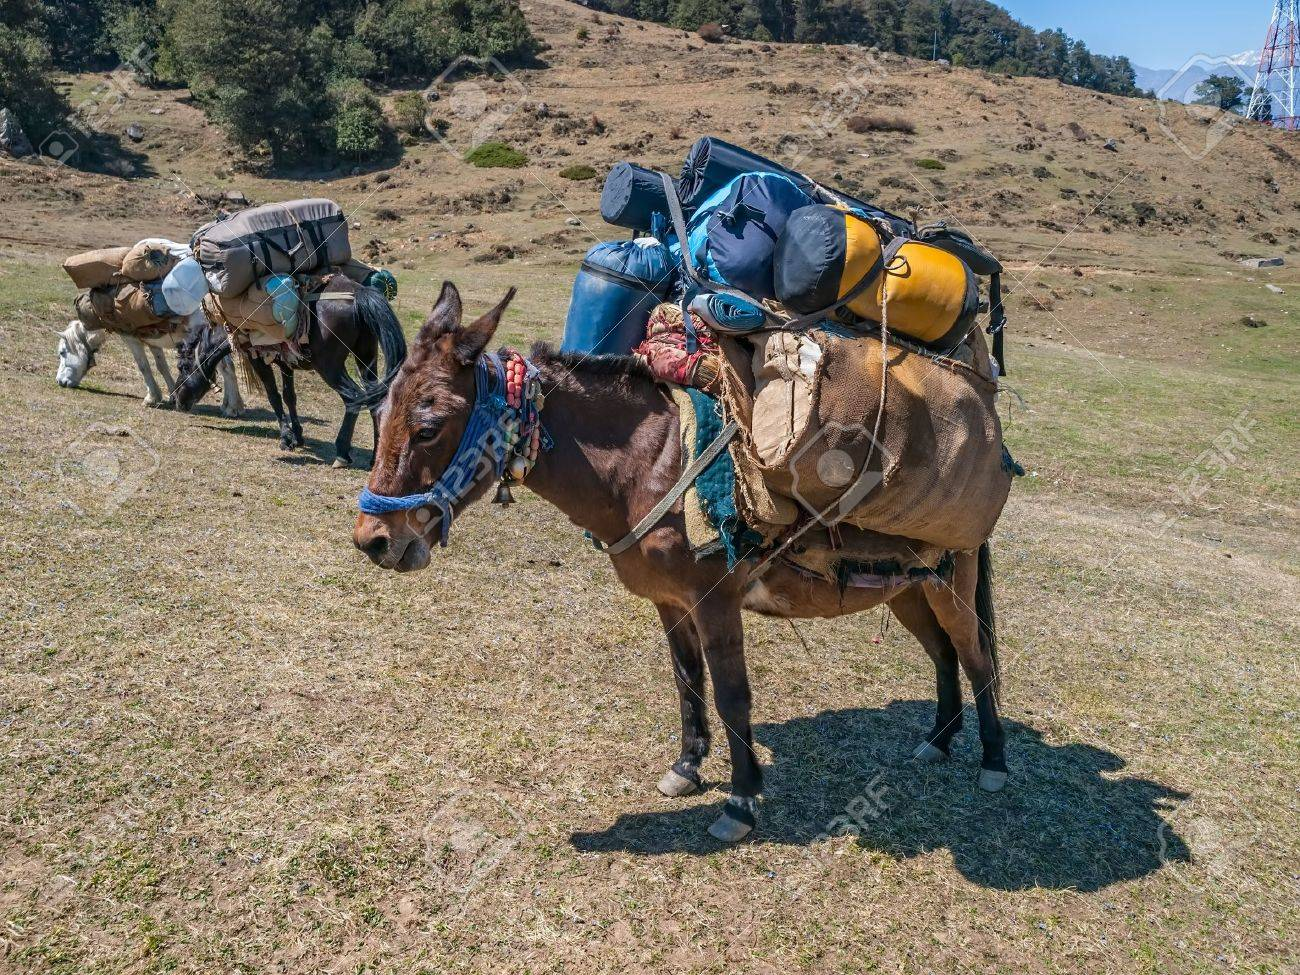 Laden mules in Himalaya somewhere in Uttarakhand, India. - 21124743